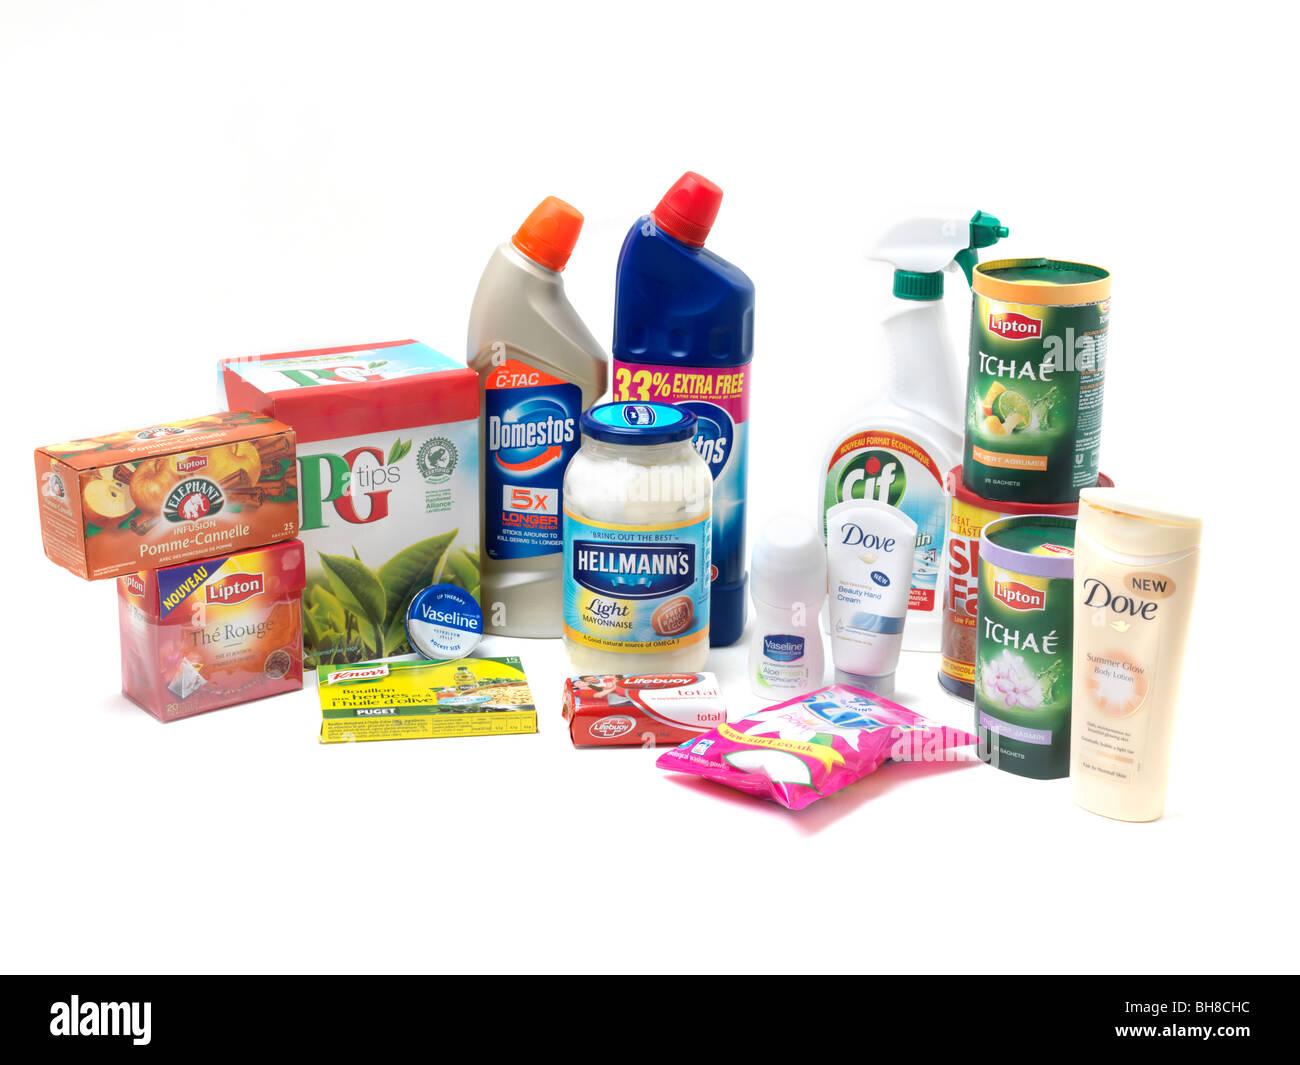 Multi National Company Unilever Products - Stock Image